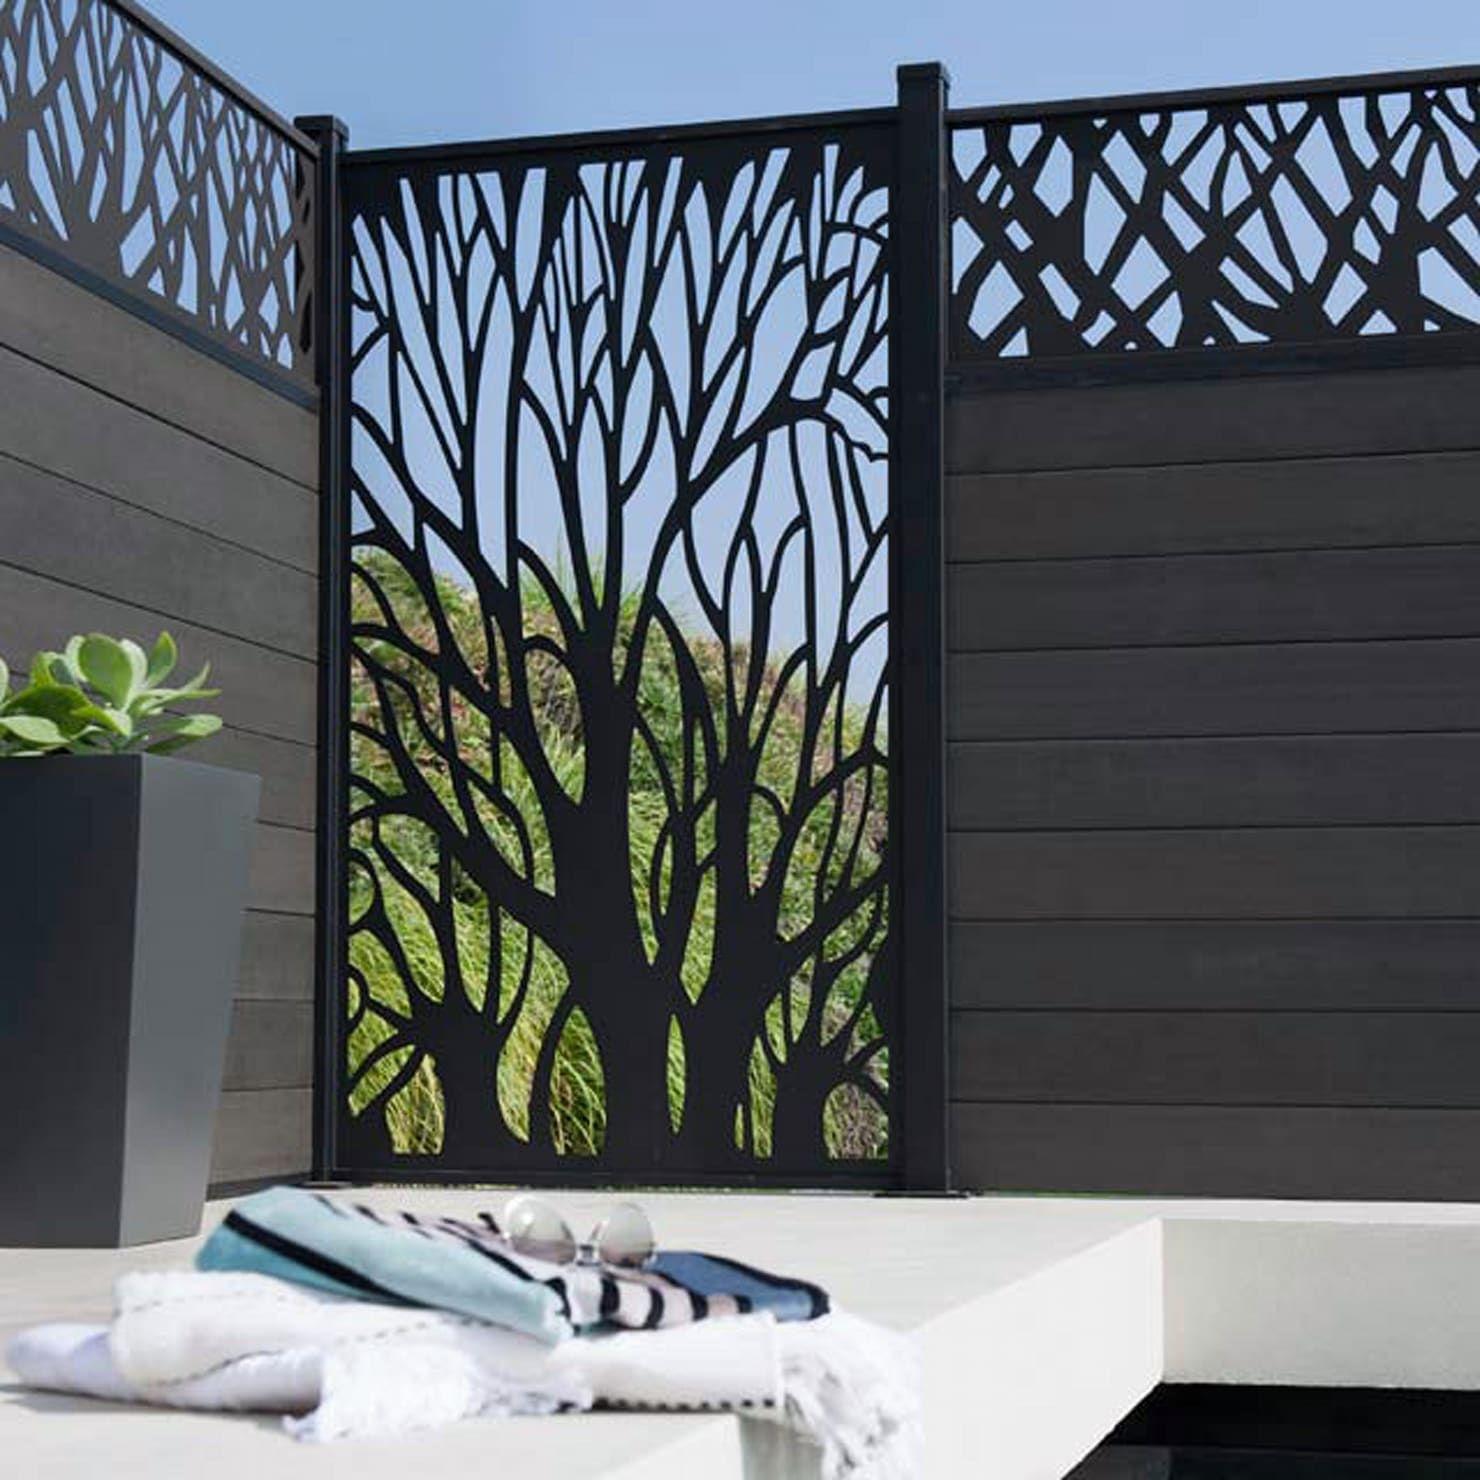 Pin By Lorna Macdougall On Garage Plans: 24 Rejas Y Láminas Perforadas Perfectas Para Casas